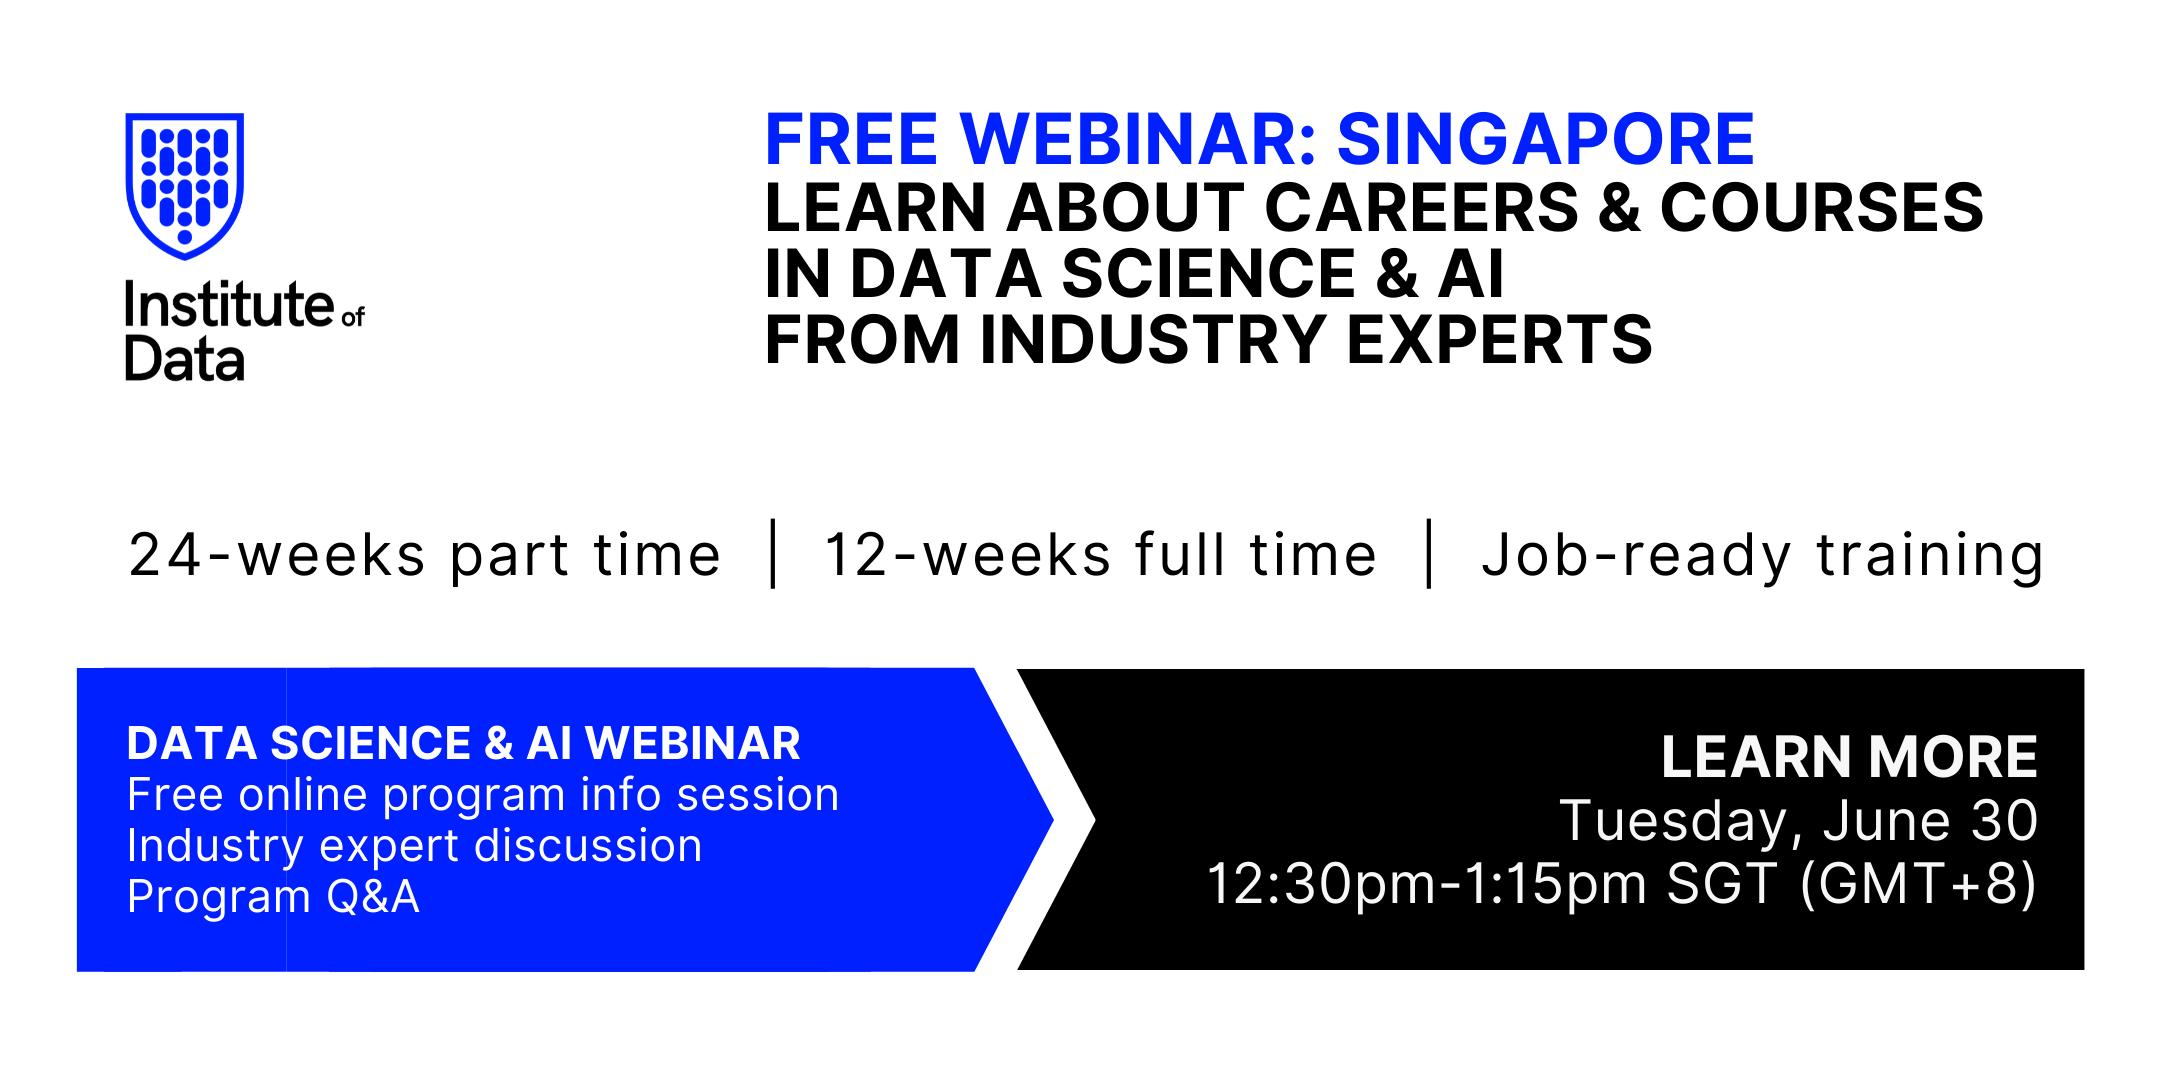 Institute of Data Singapore - Data Science Program - Online Info Session - June 30